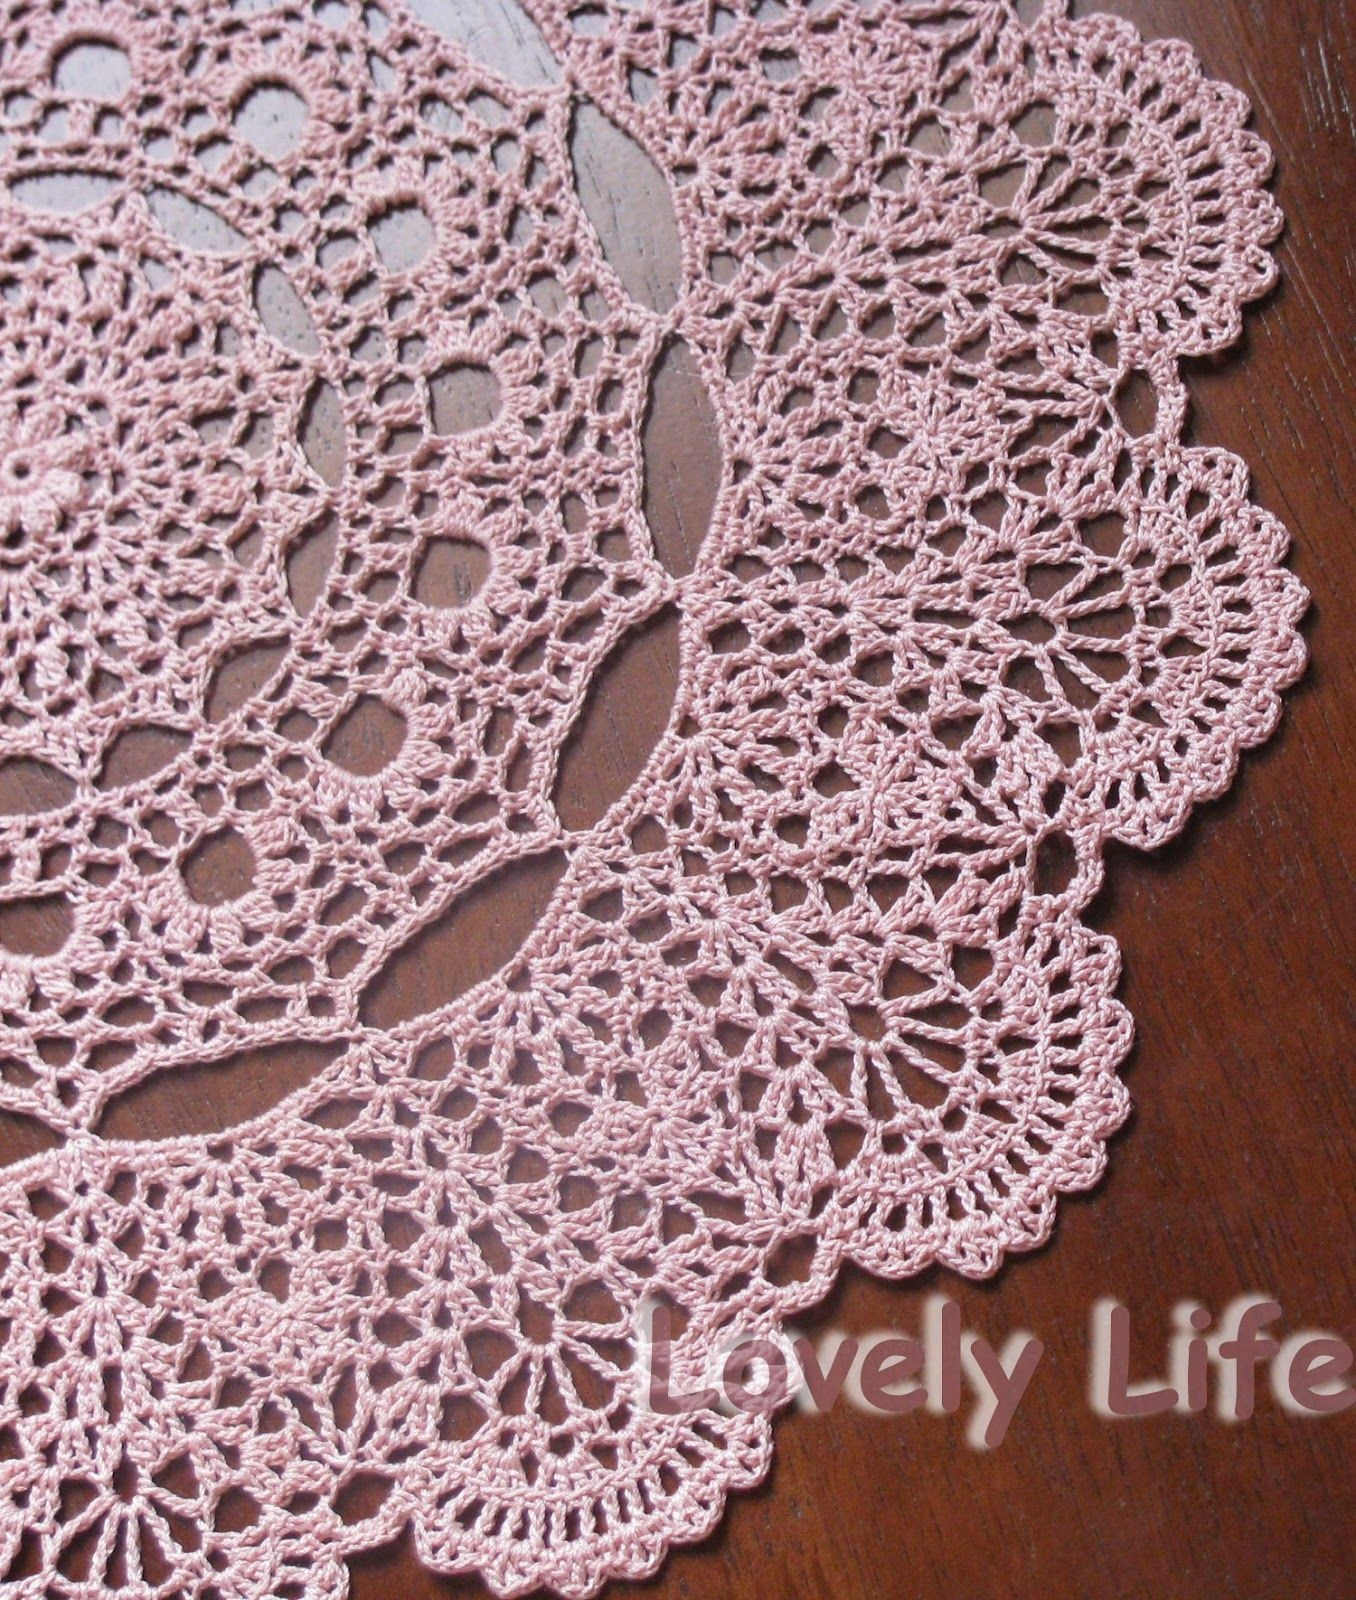 Free Printable Crochet Doily Patterns   Mantilla Doily - Close Up - Free Printable Crochet Patterns